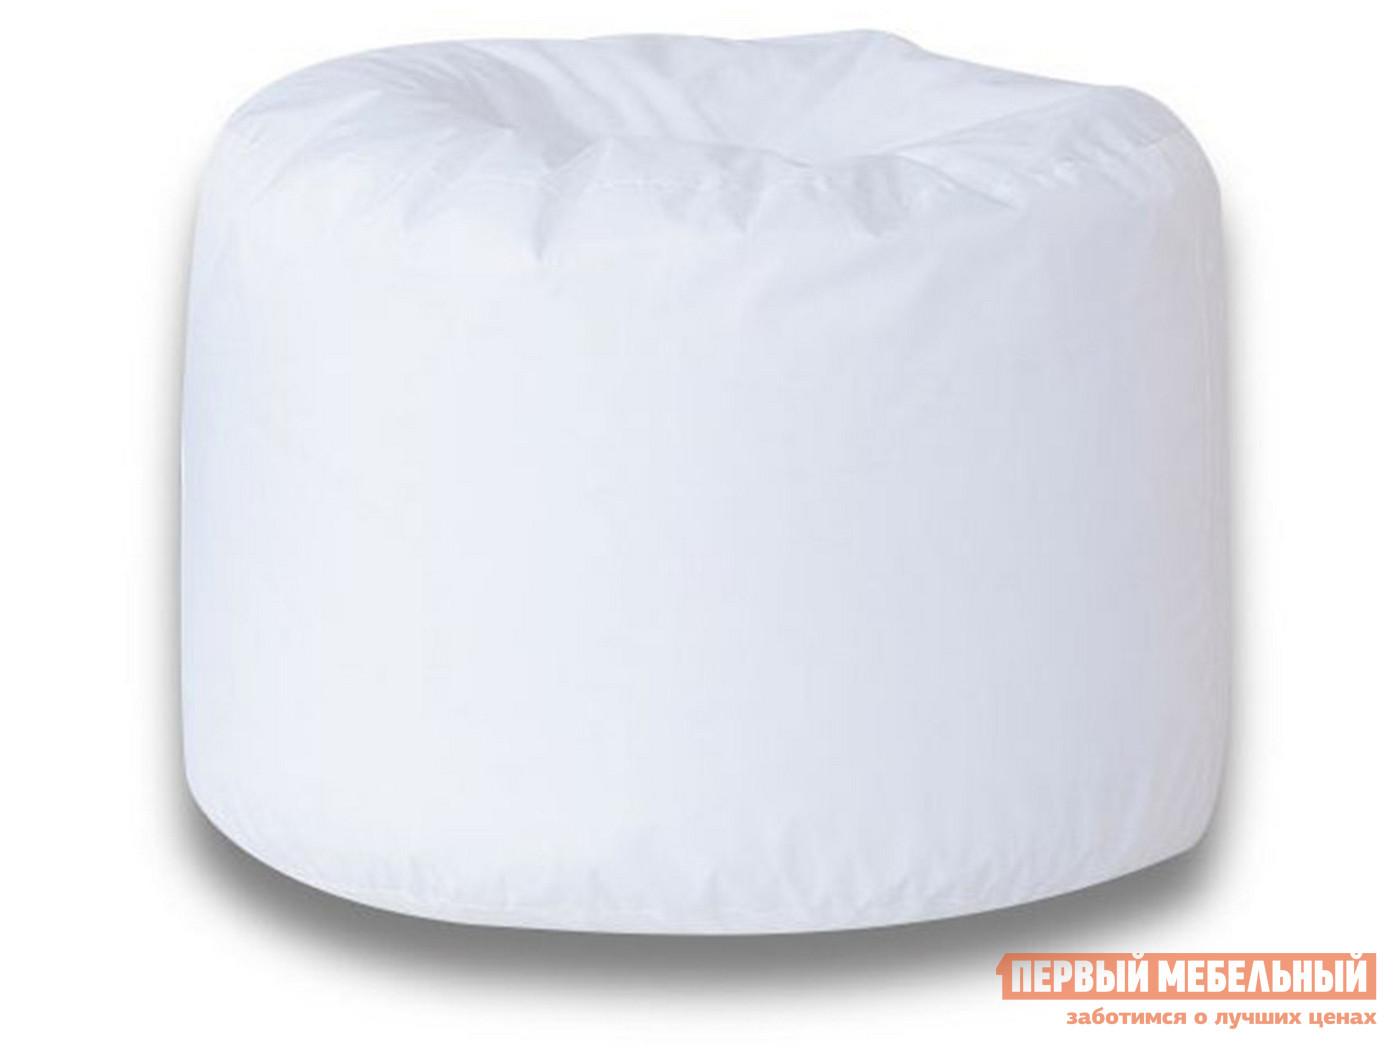 Пуфик  Круг Белый — Круг Белый